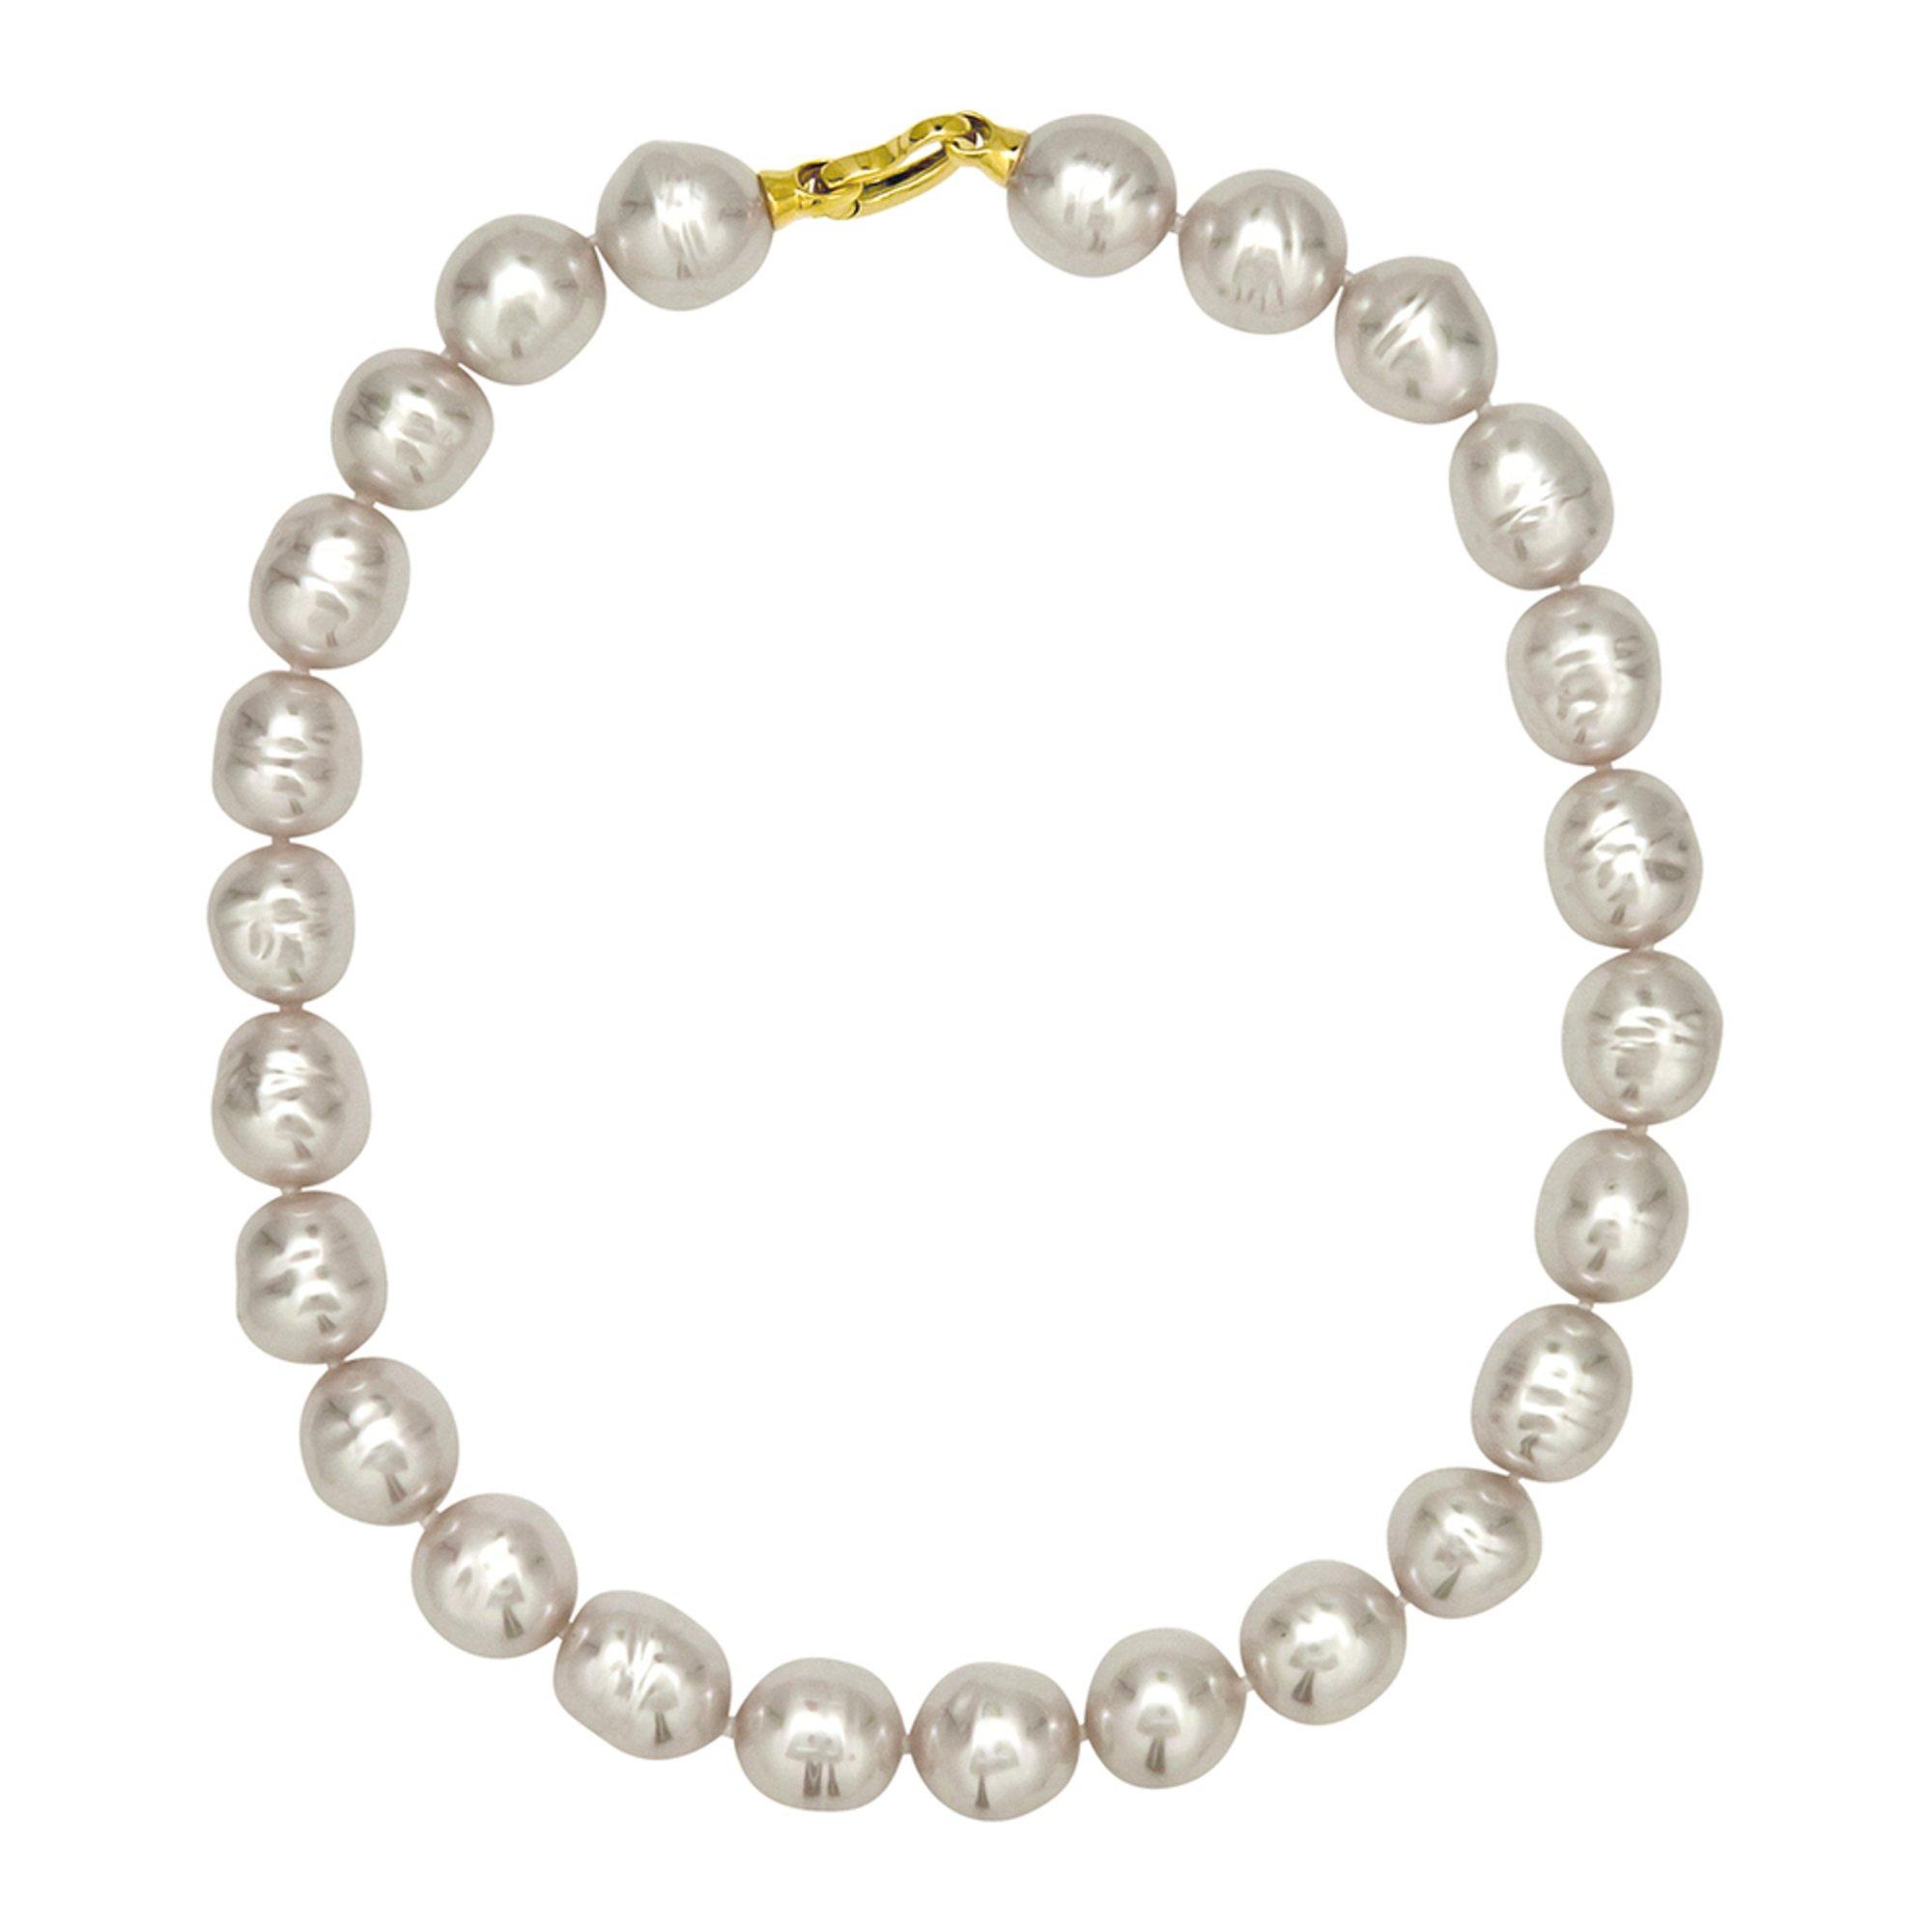 Majorica 14mm Simulated Baroque Pearl